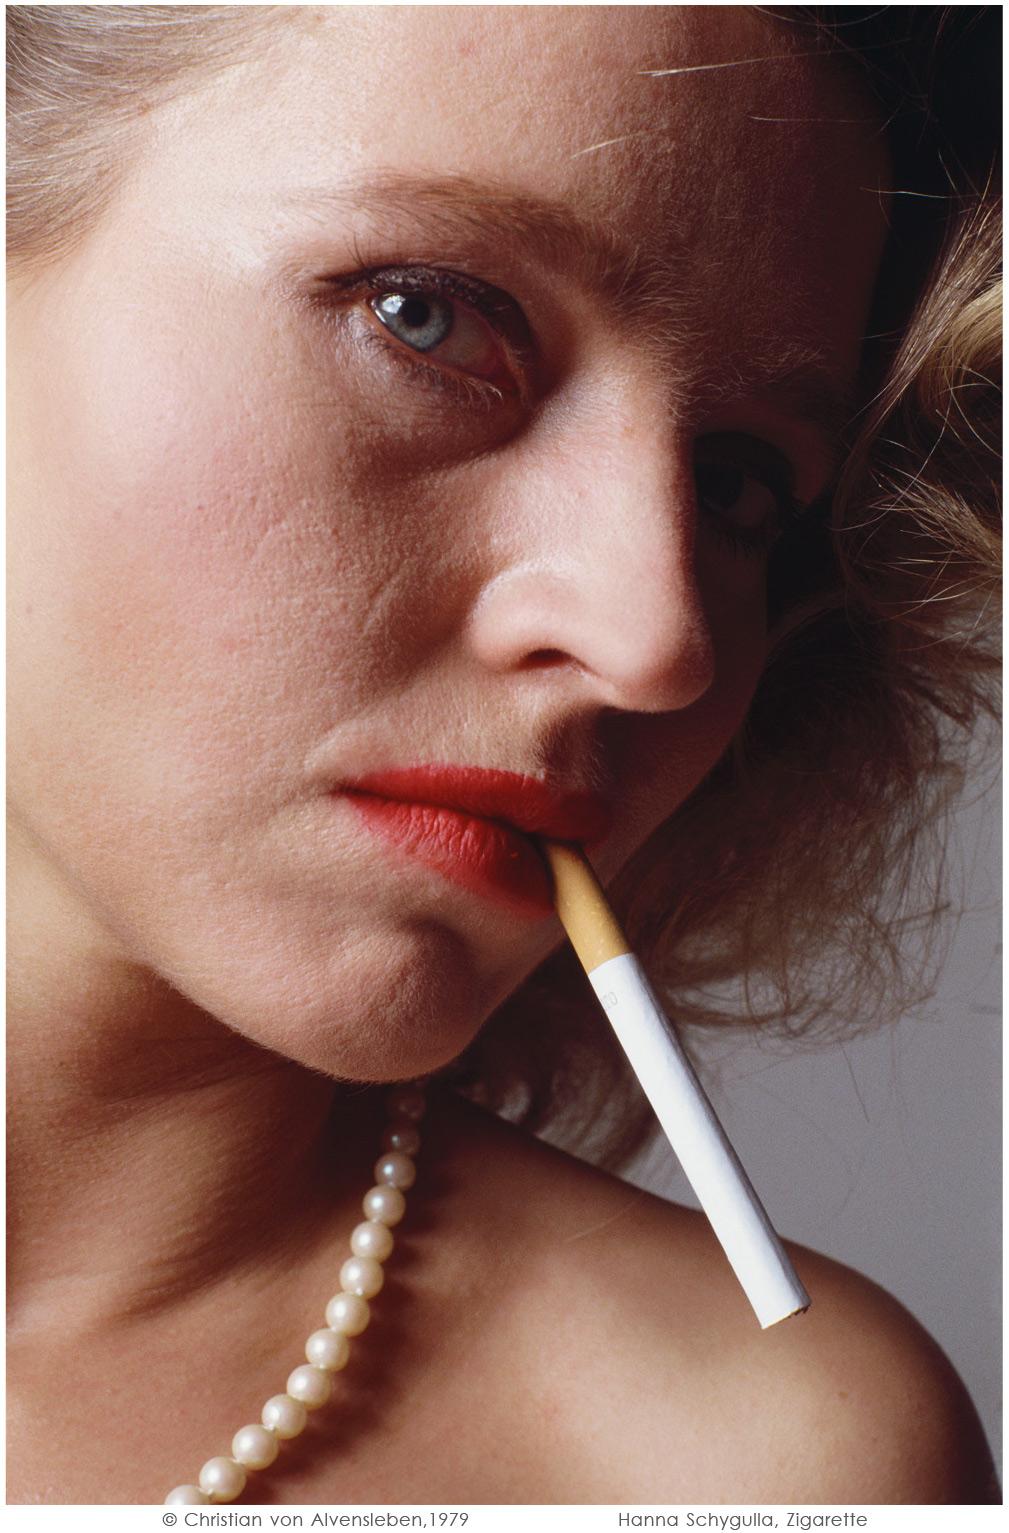 Hanna Schygulla, Zigarette